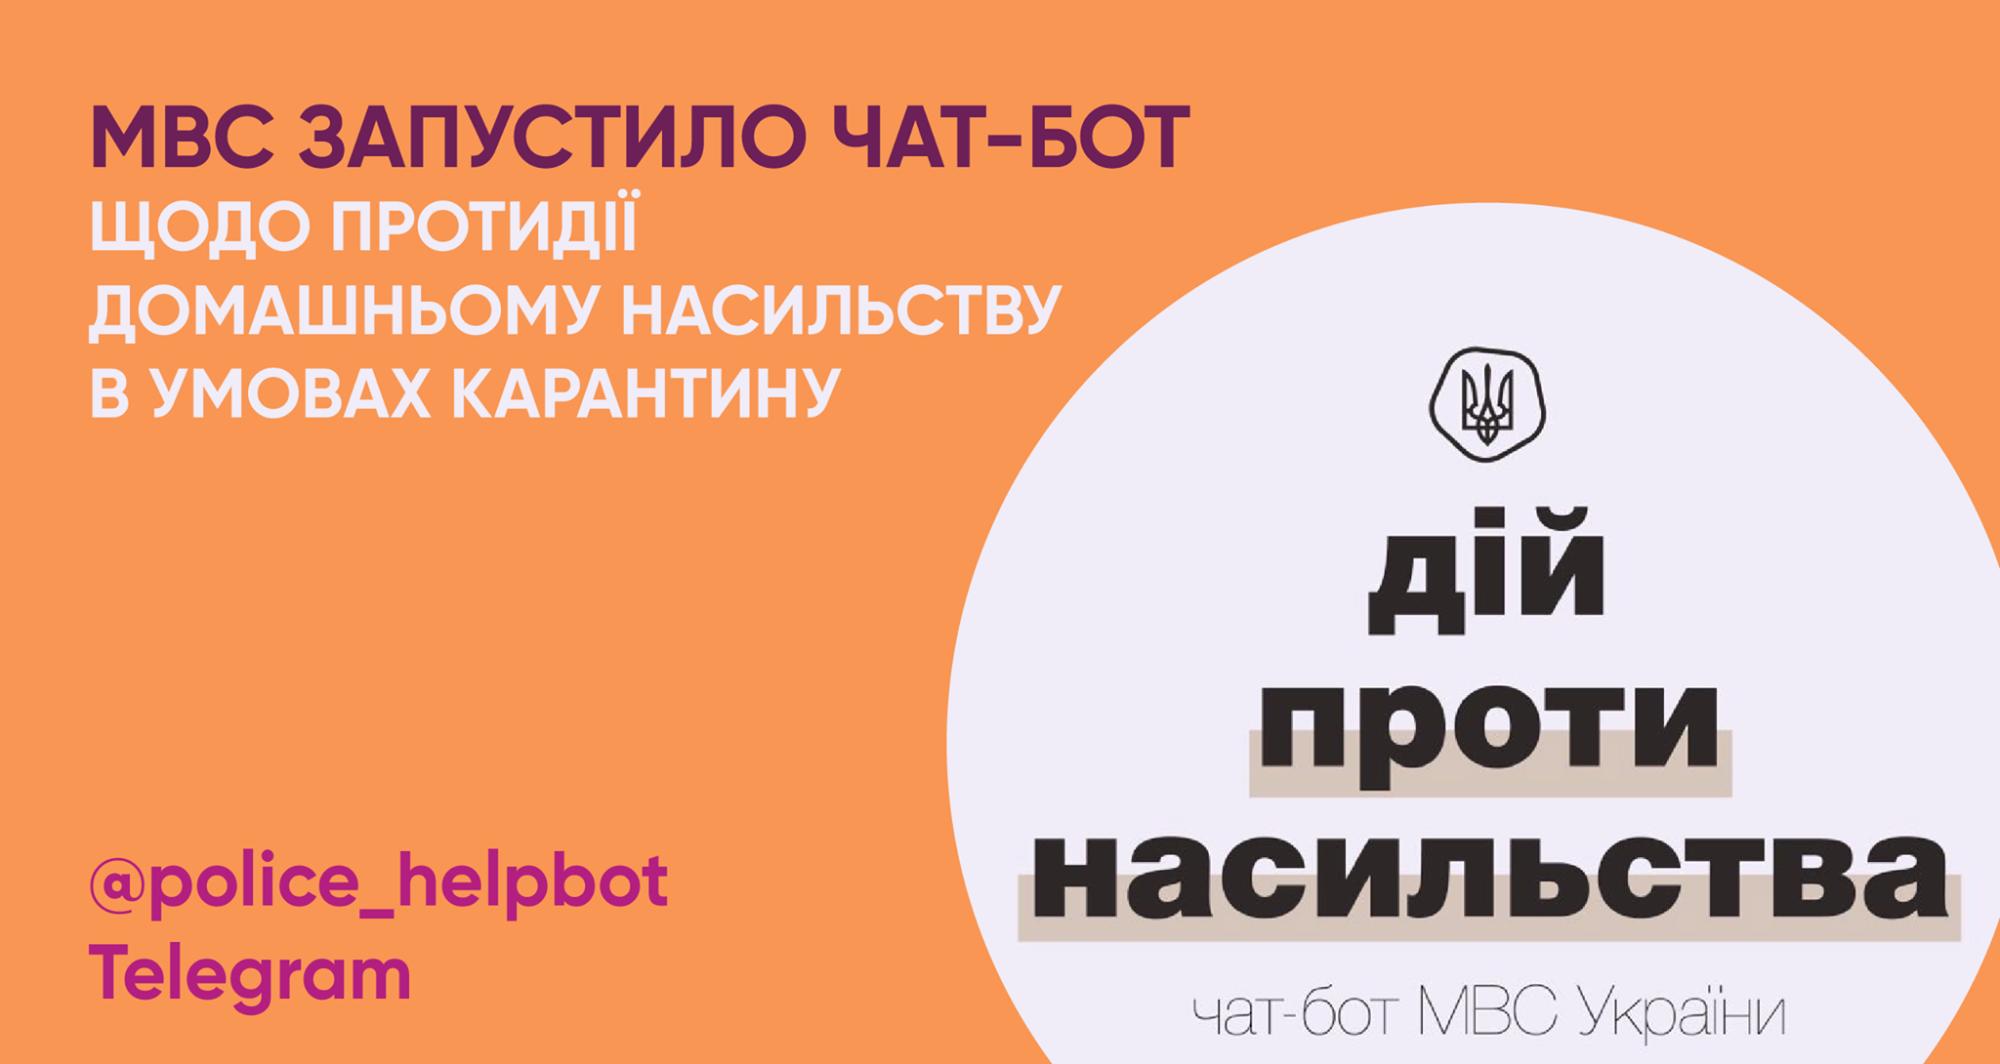 Стоп домашньому насильству в умовах карантину: МВС України запустило чат-бот -  - 93303550 3121796061177848 8110418381213007872 o 2000x1064